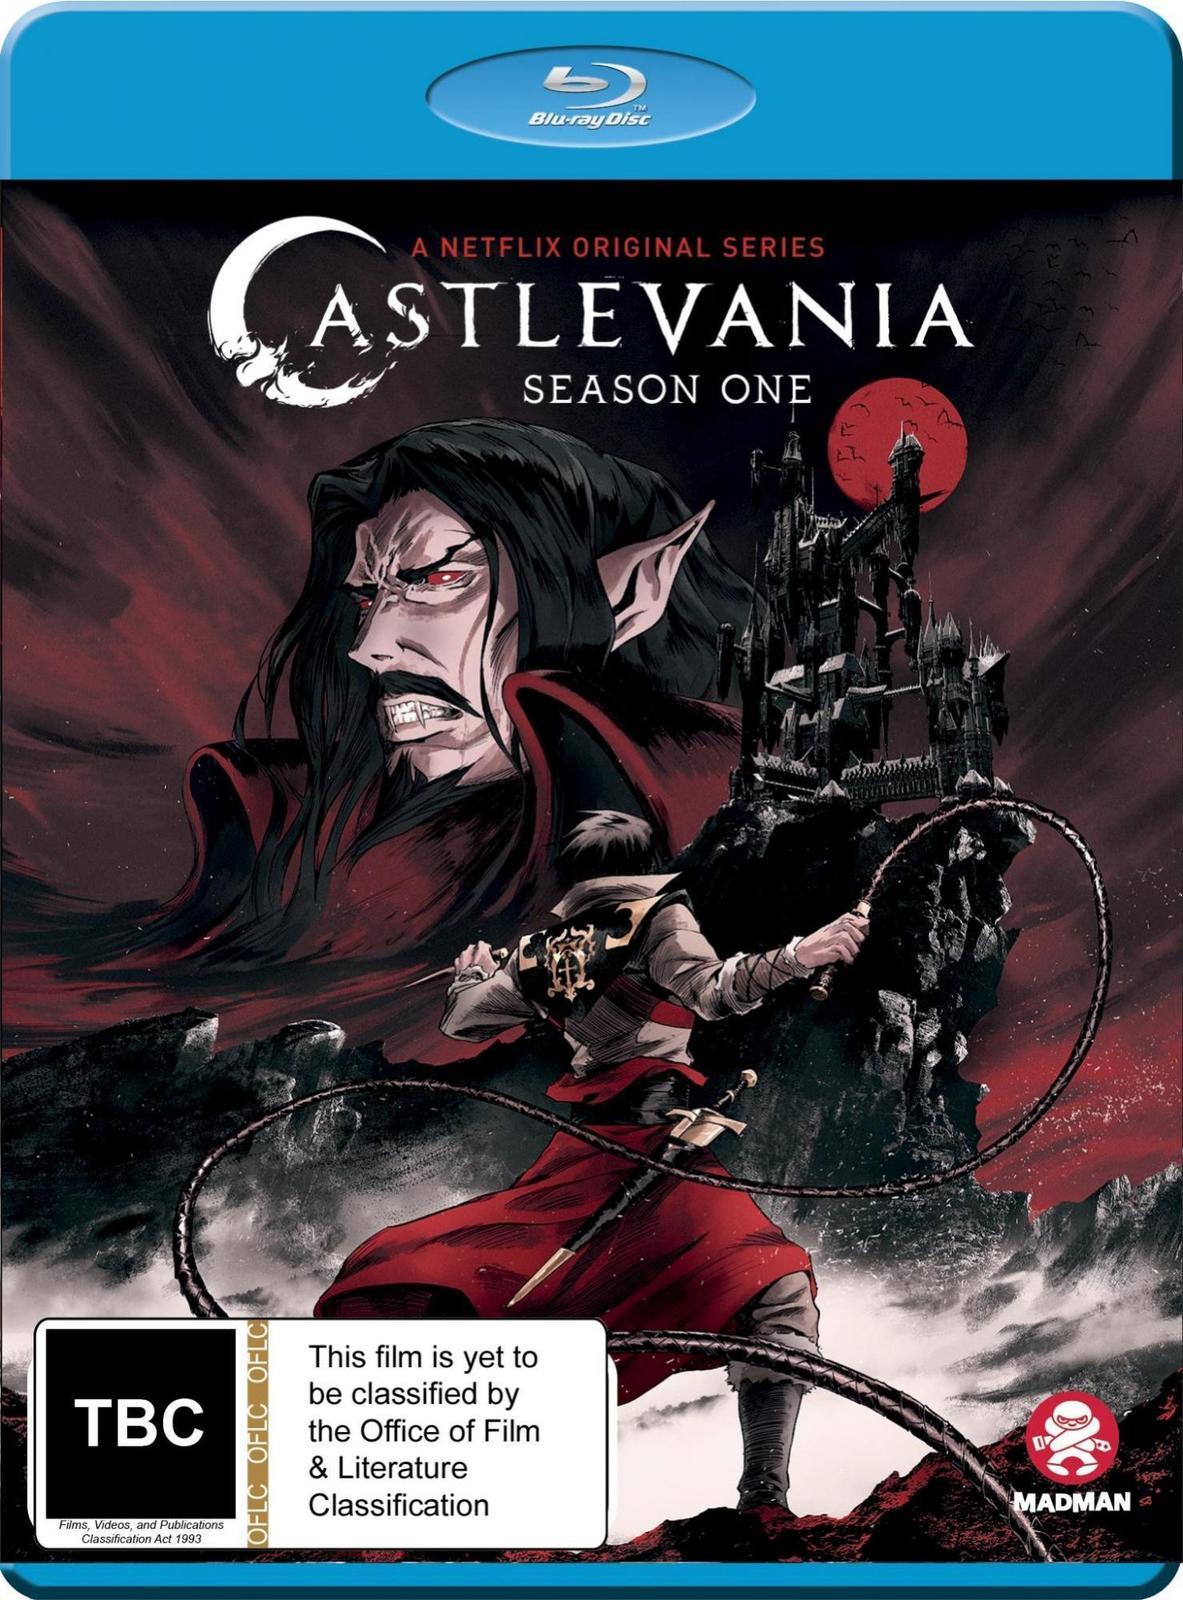 Castlevania: Complete Season 1 on Blu-ray image